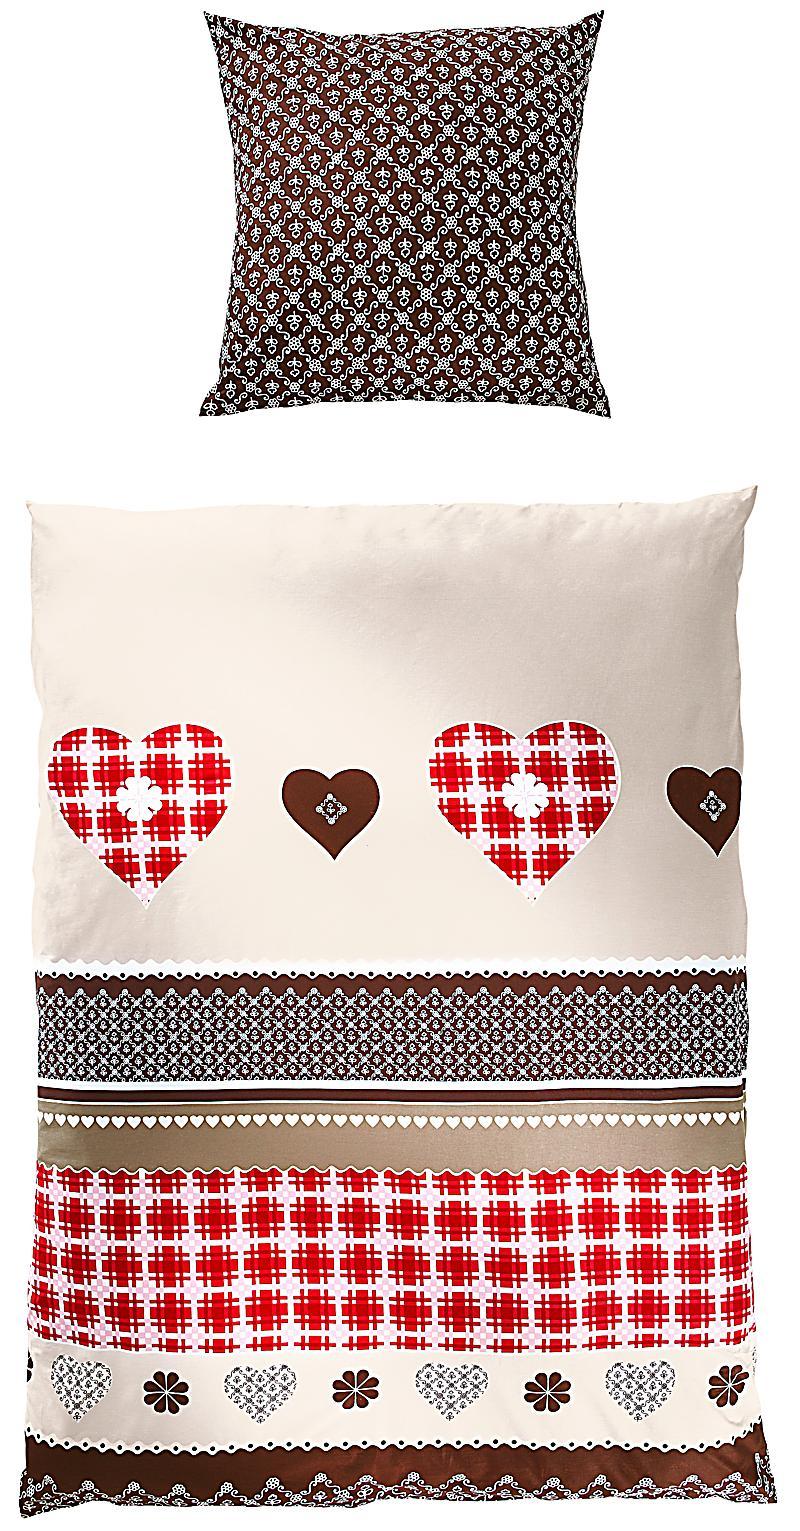 bettw sche kitzb hel gr e 155 x 220 cm bestellen. Black Bedroom Furniture Sets. Home Design Ideas